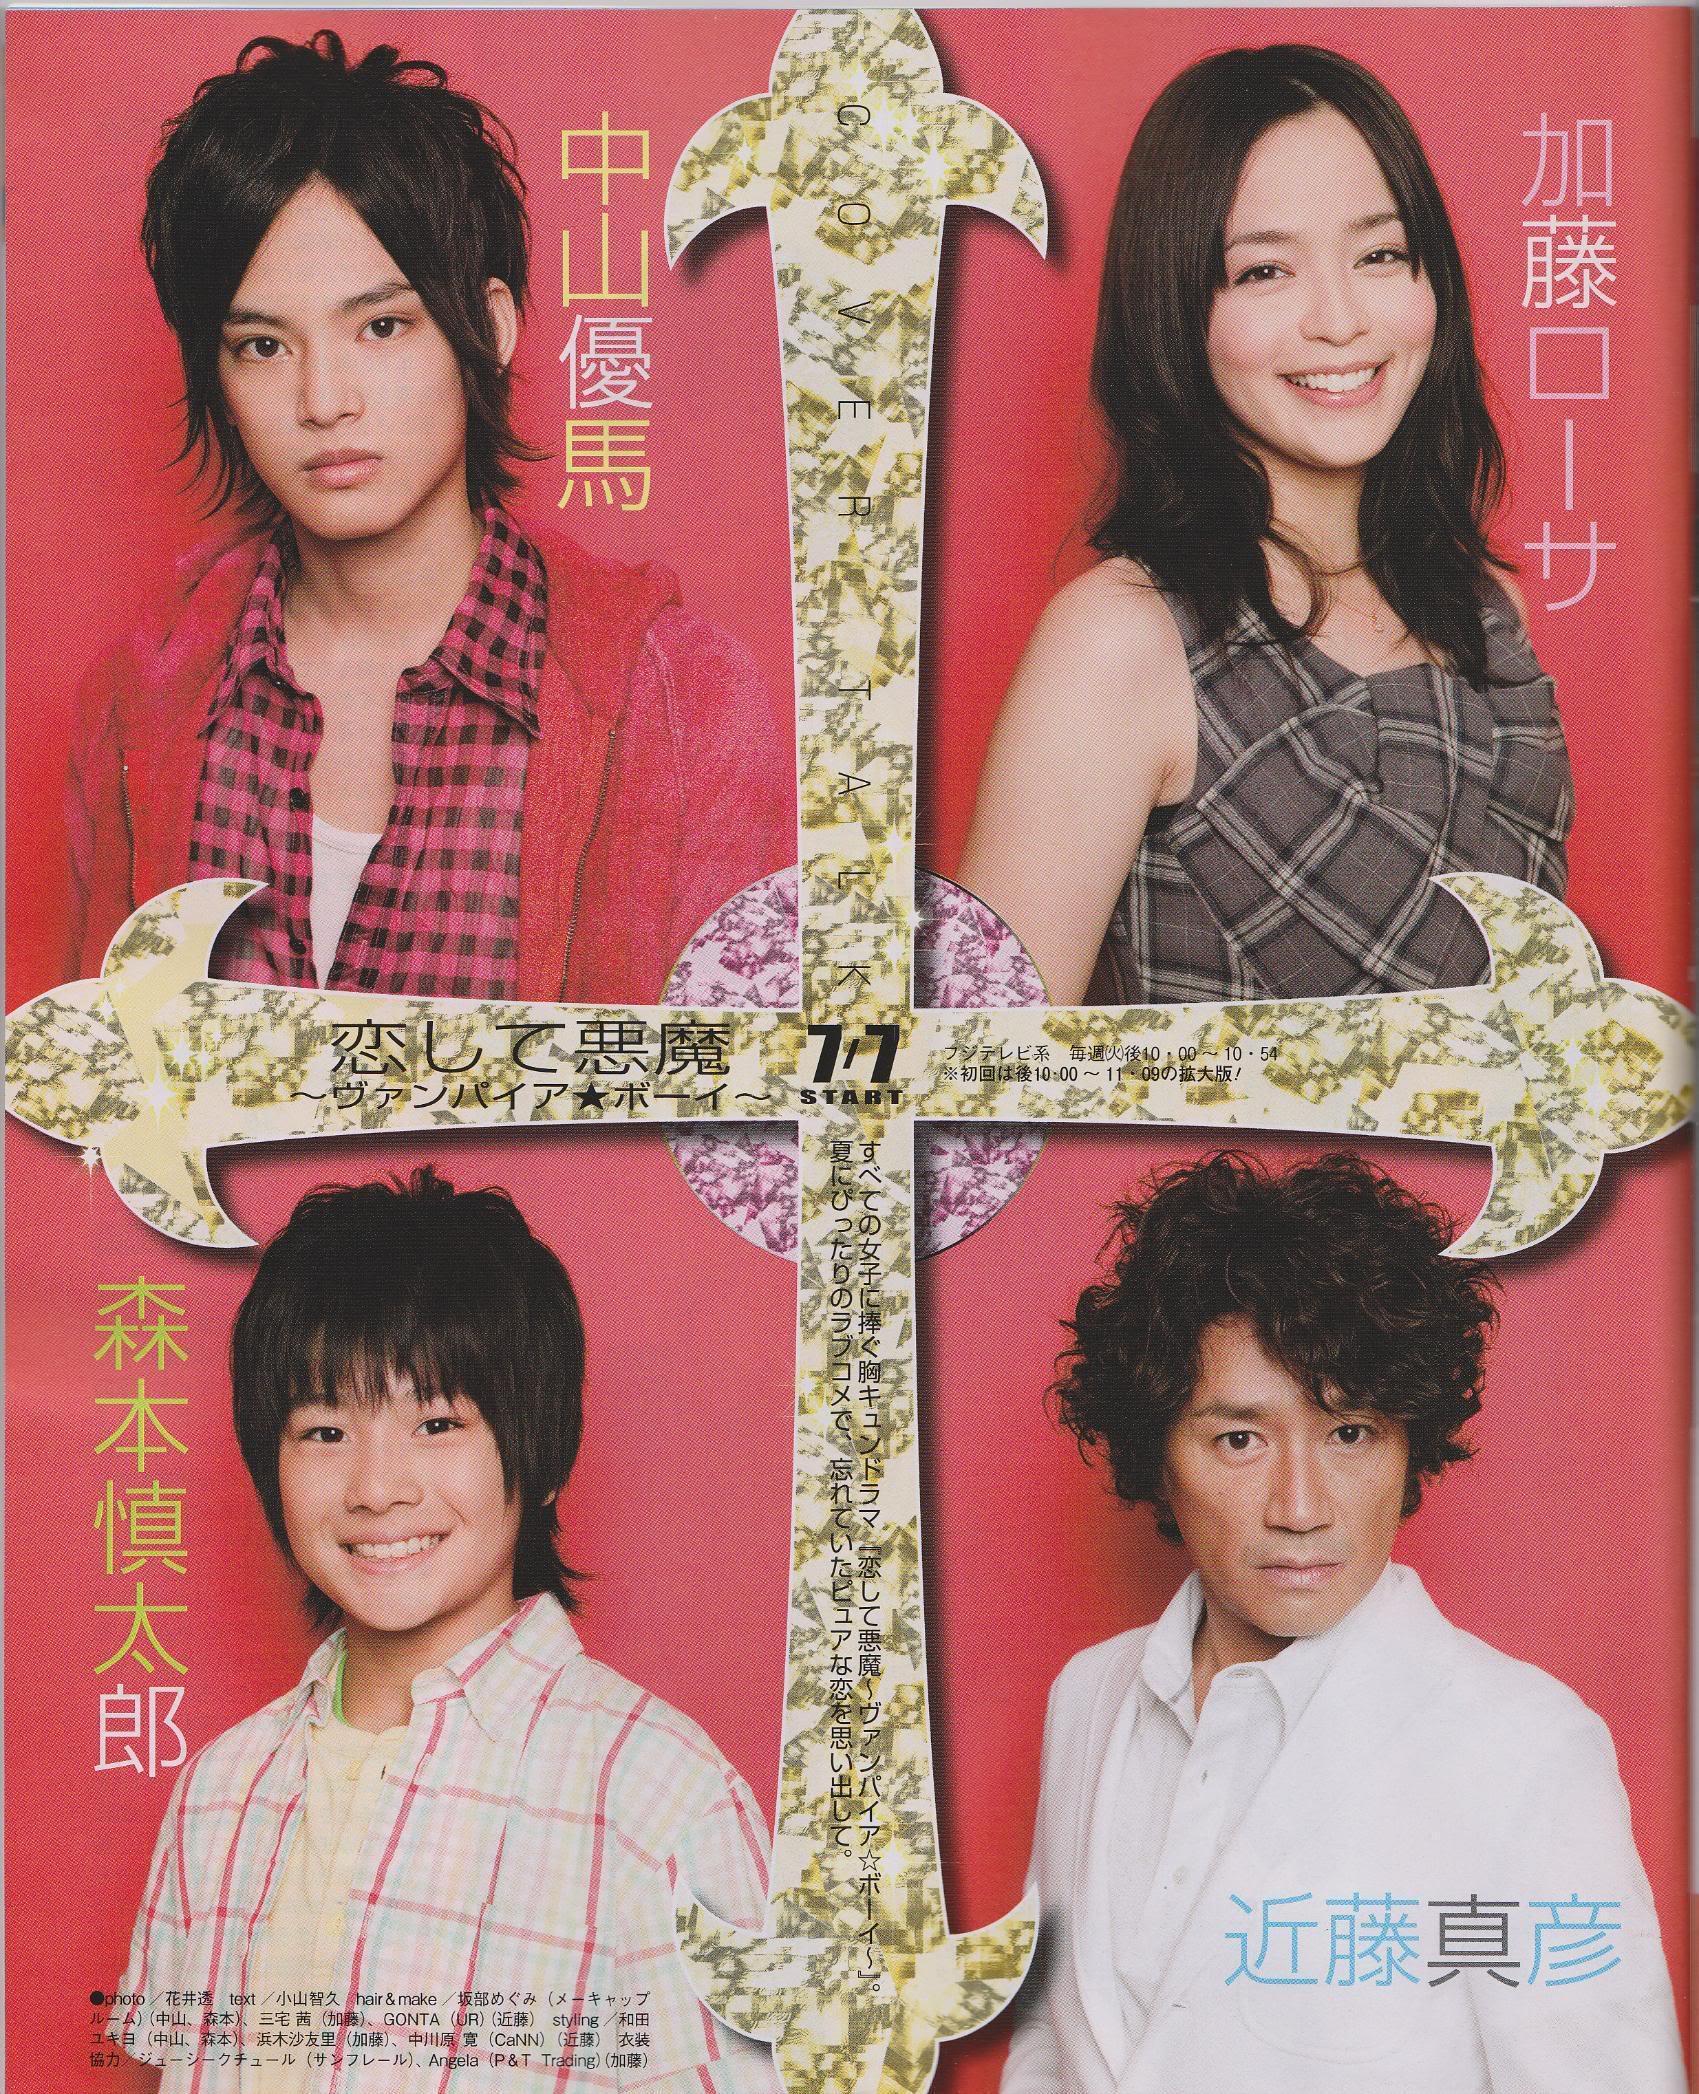 Fan club Nakayama Yuma 00082pfg